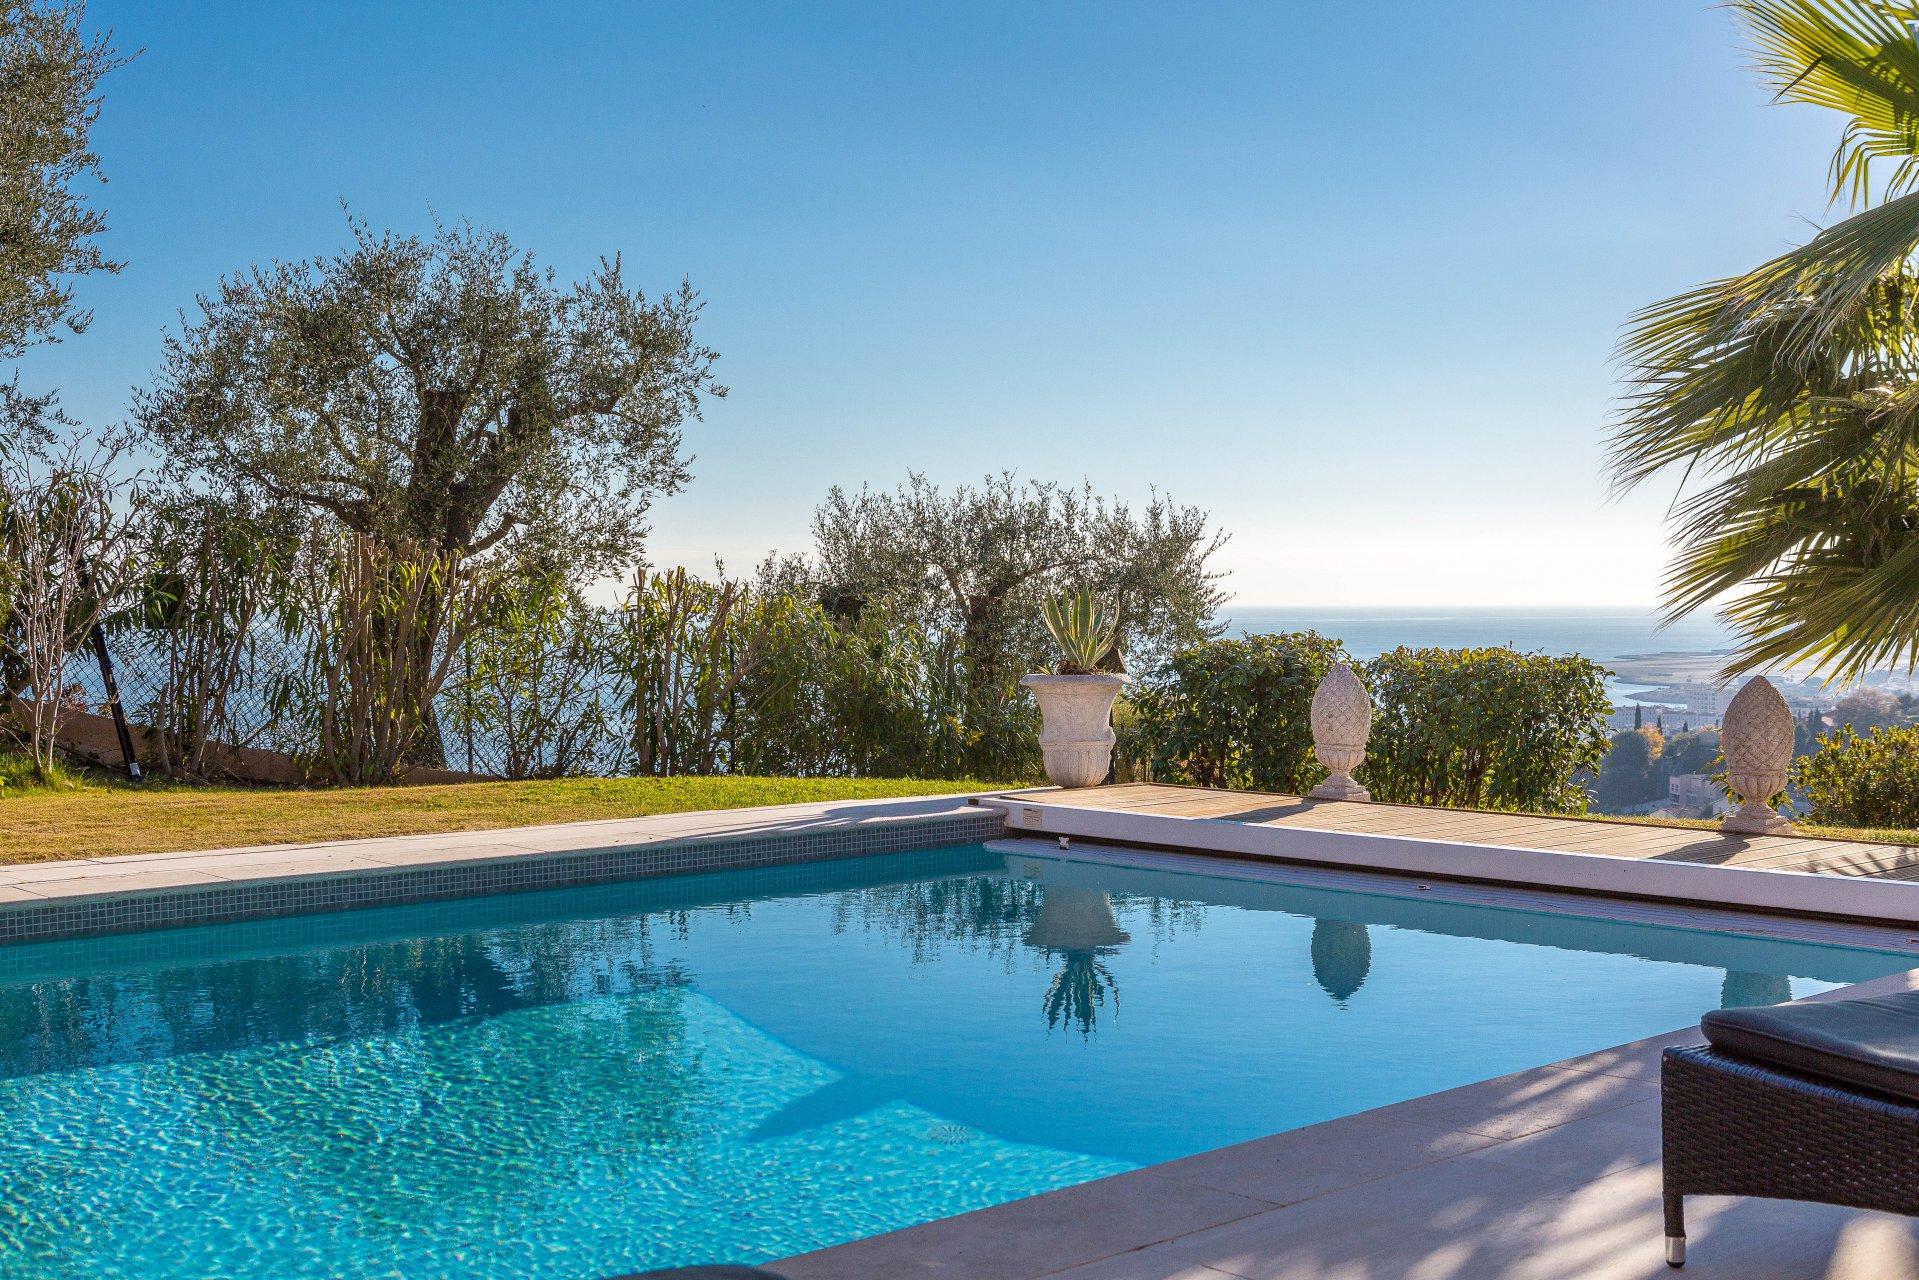 NICE - Magnan - Belle villa 5 chambres avec vue mer - piscine chauffée